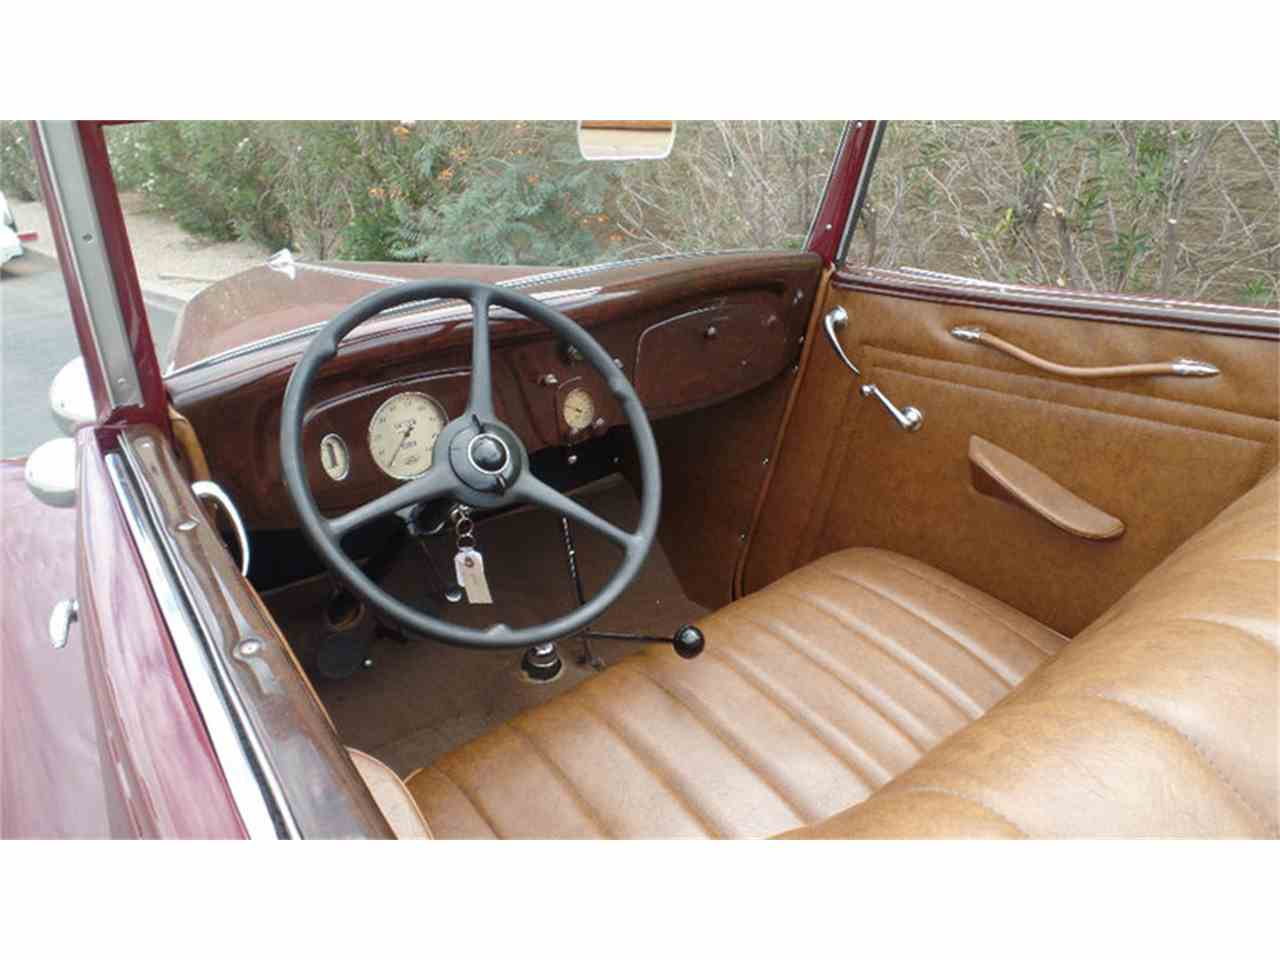 1934 Ford Cabriolet For Sale Classiccars Com Cc 885894